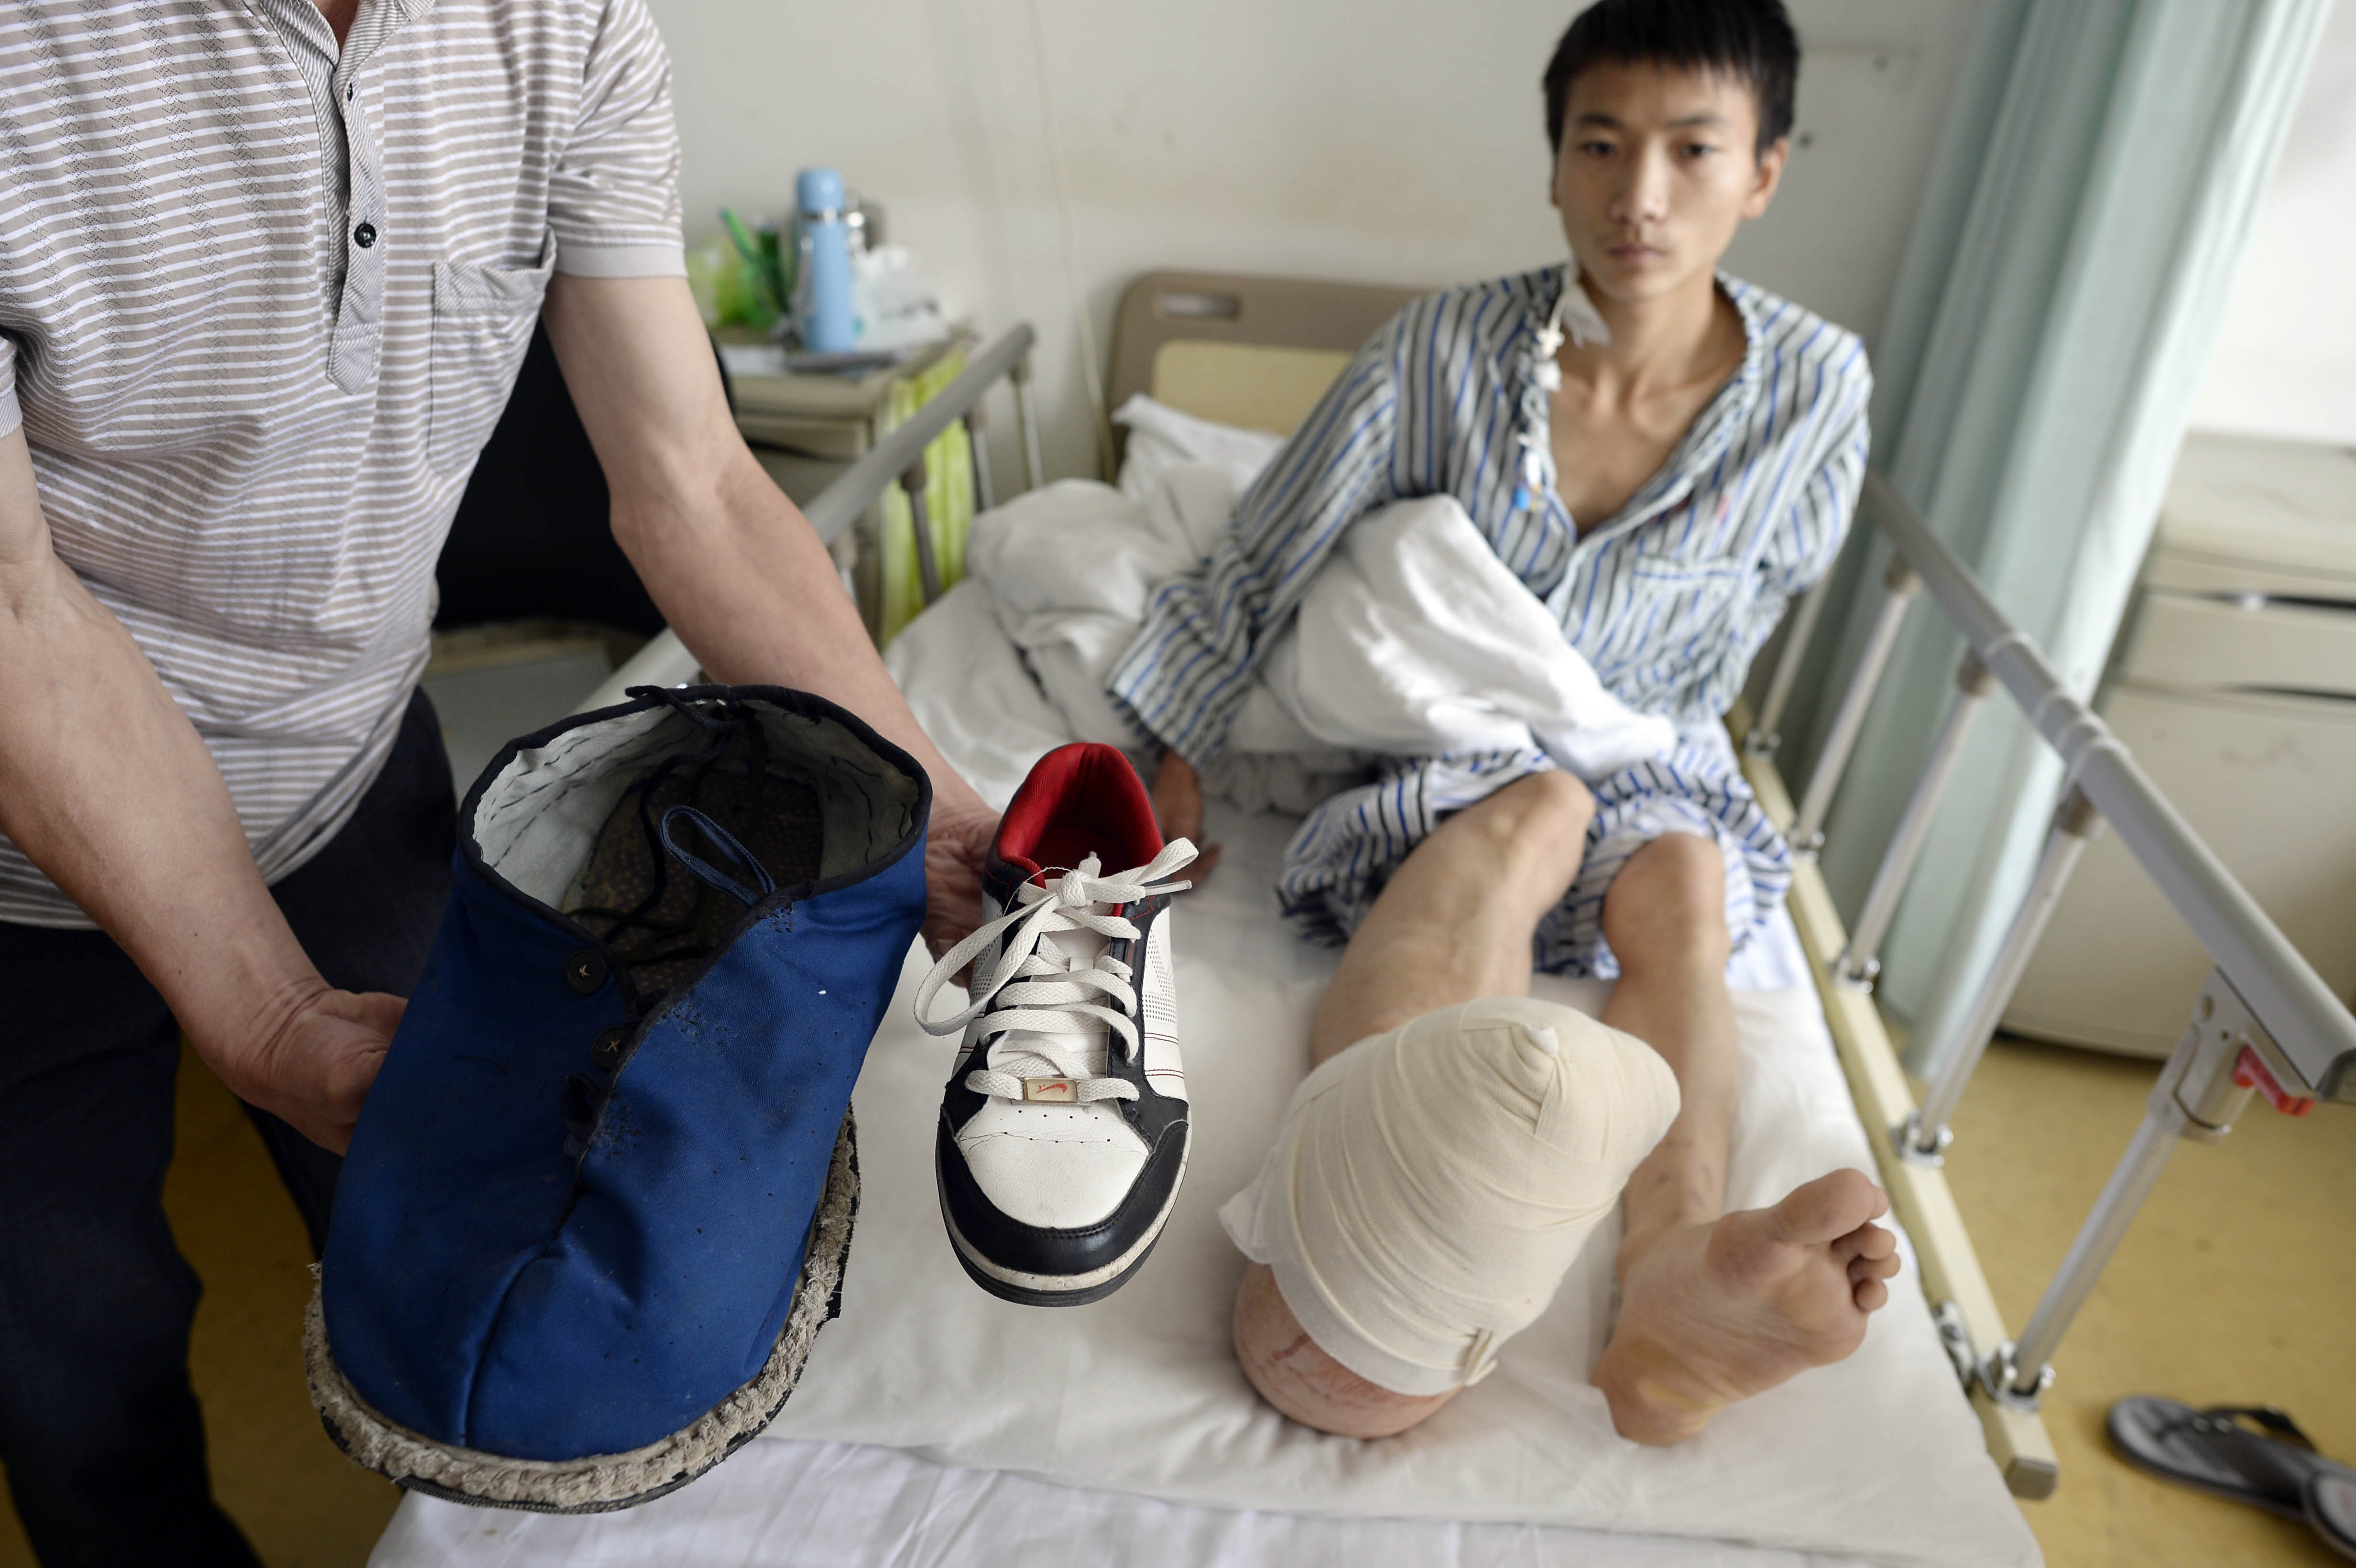 Drama unui tanar chinez care sufera de gigantism local. Liu are un picior urias, dar spera sa poata juca baschet. FOTO